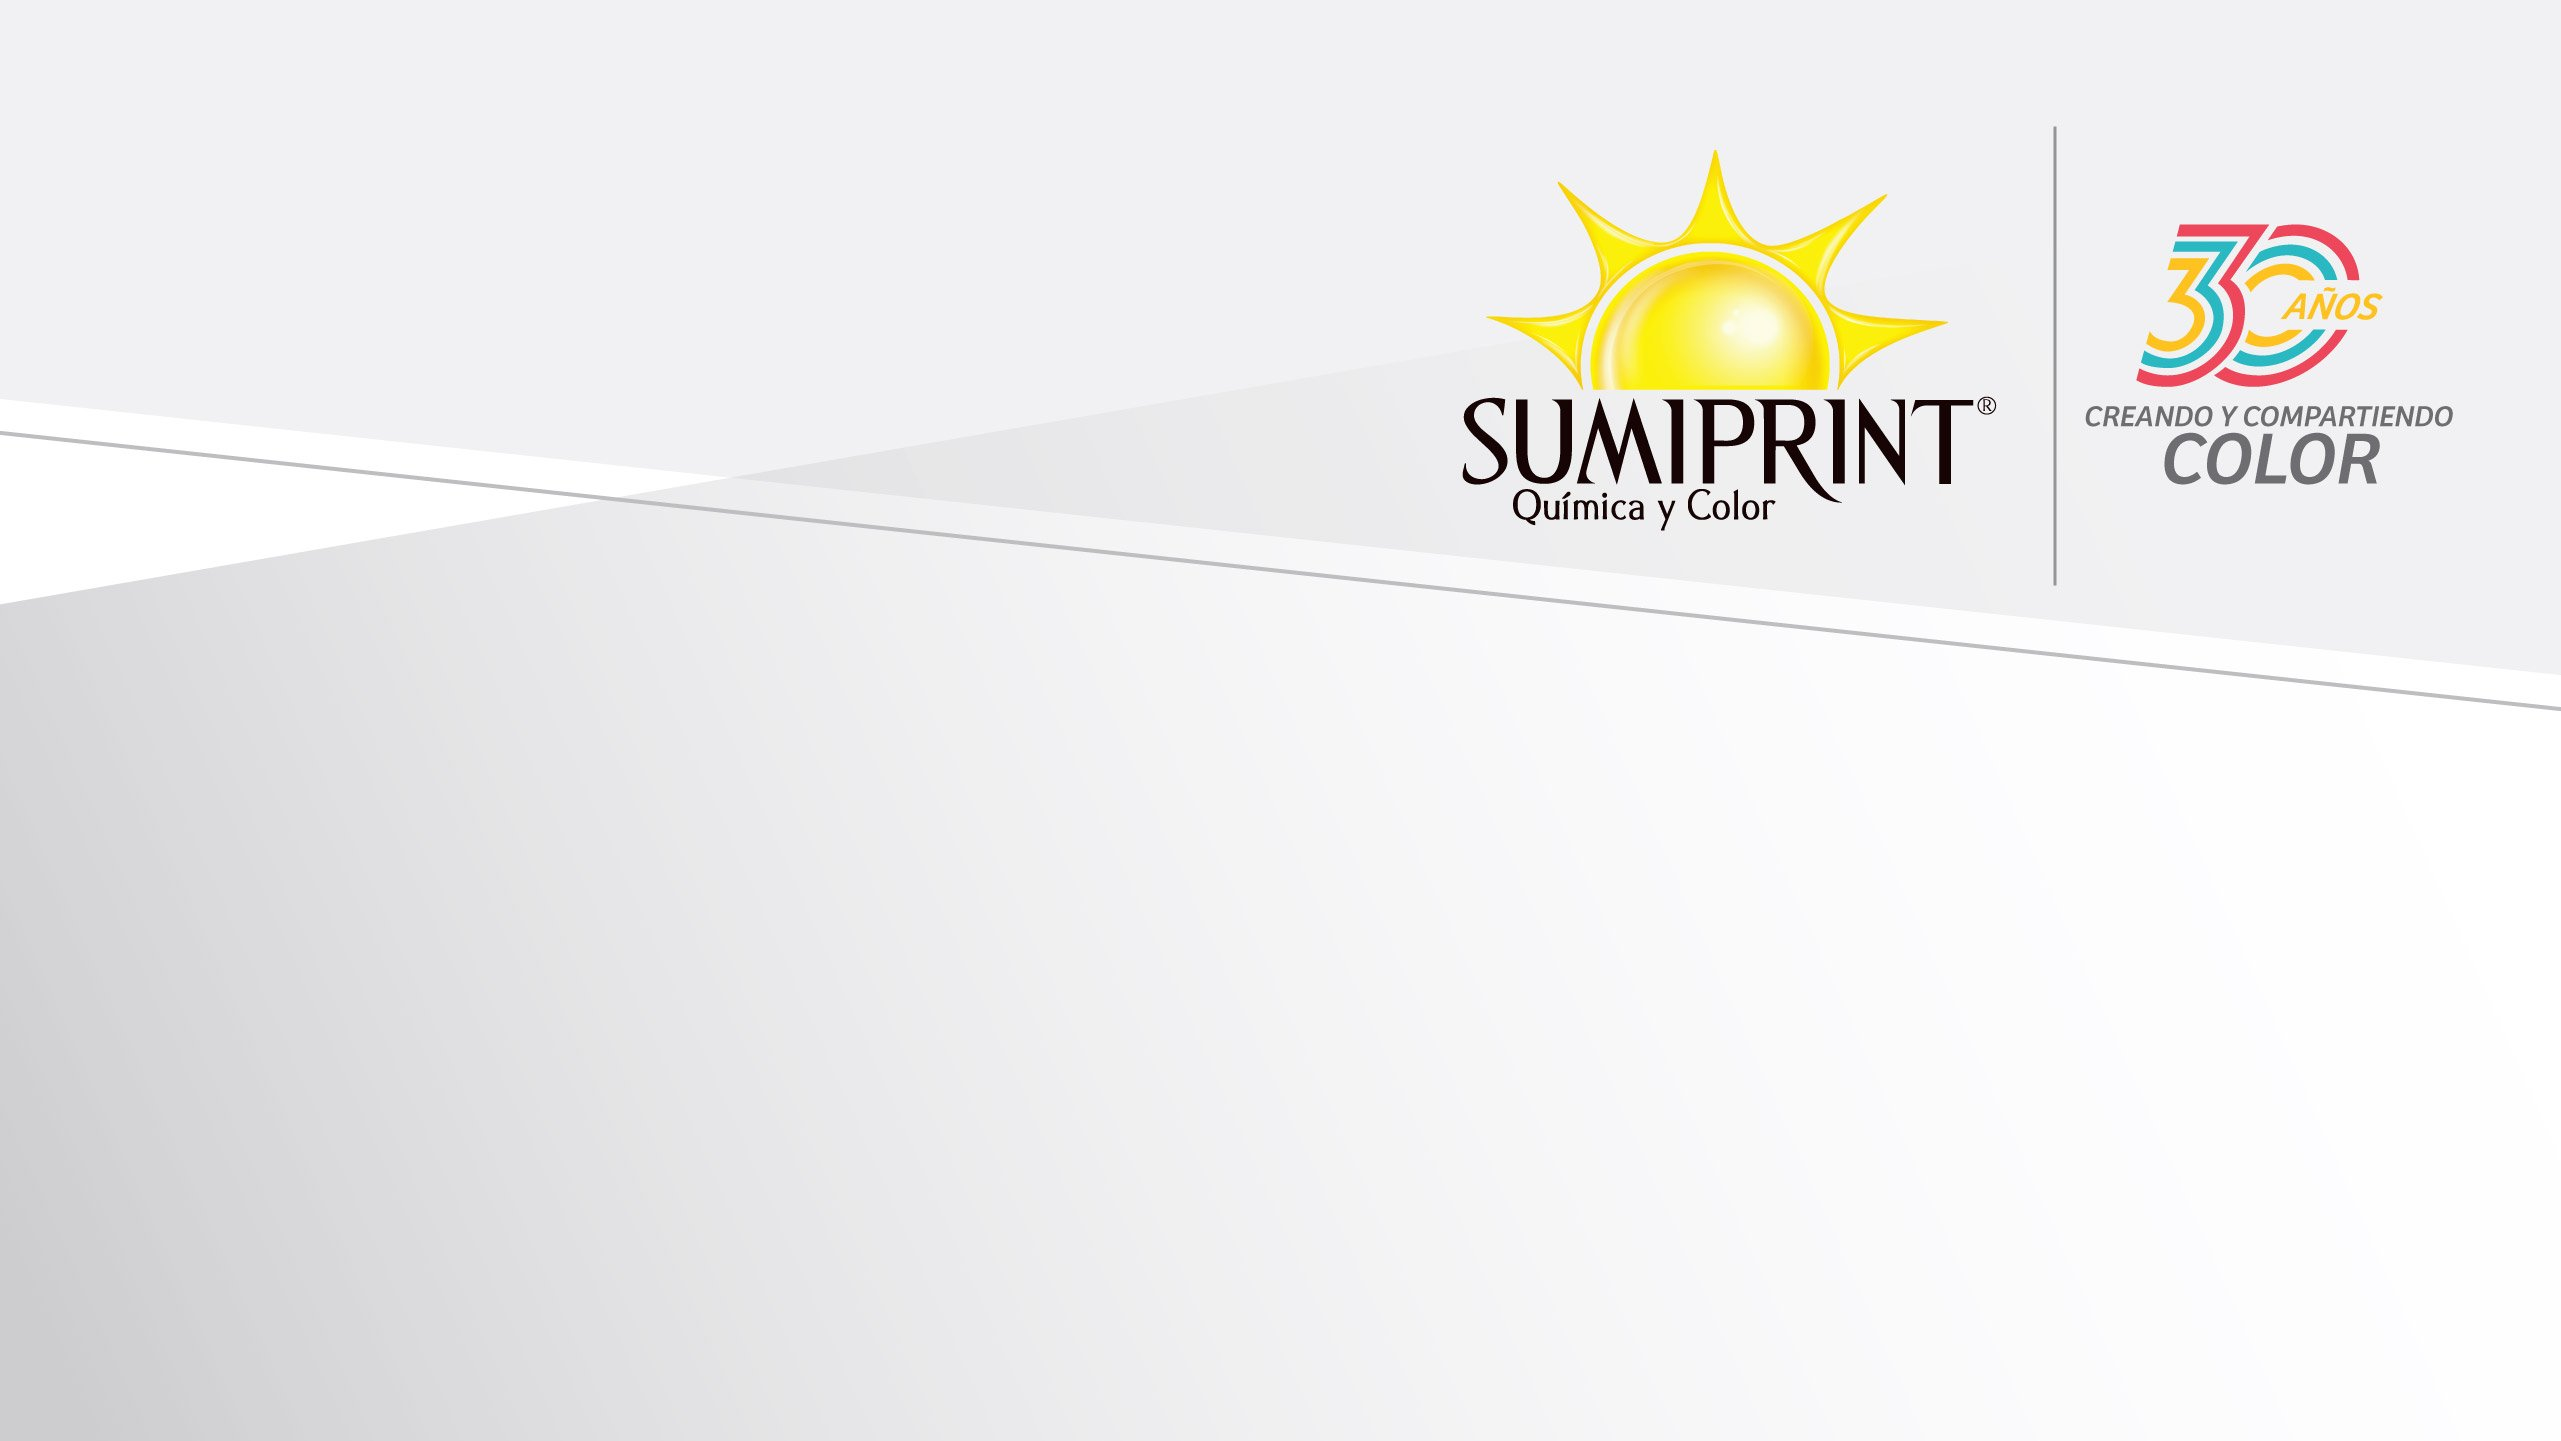 Inicio, Sumiprint